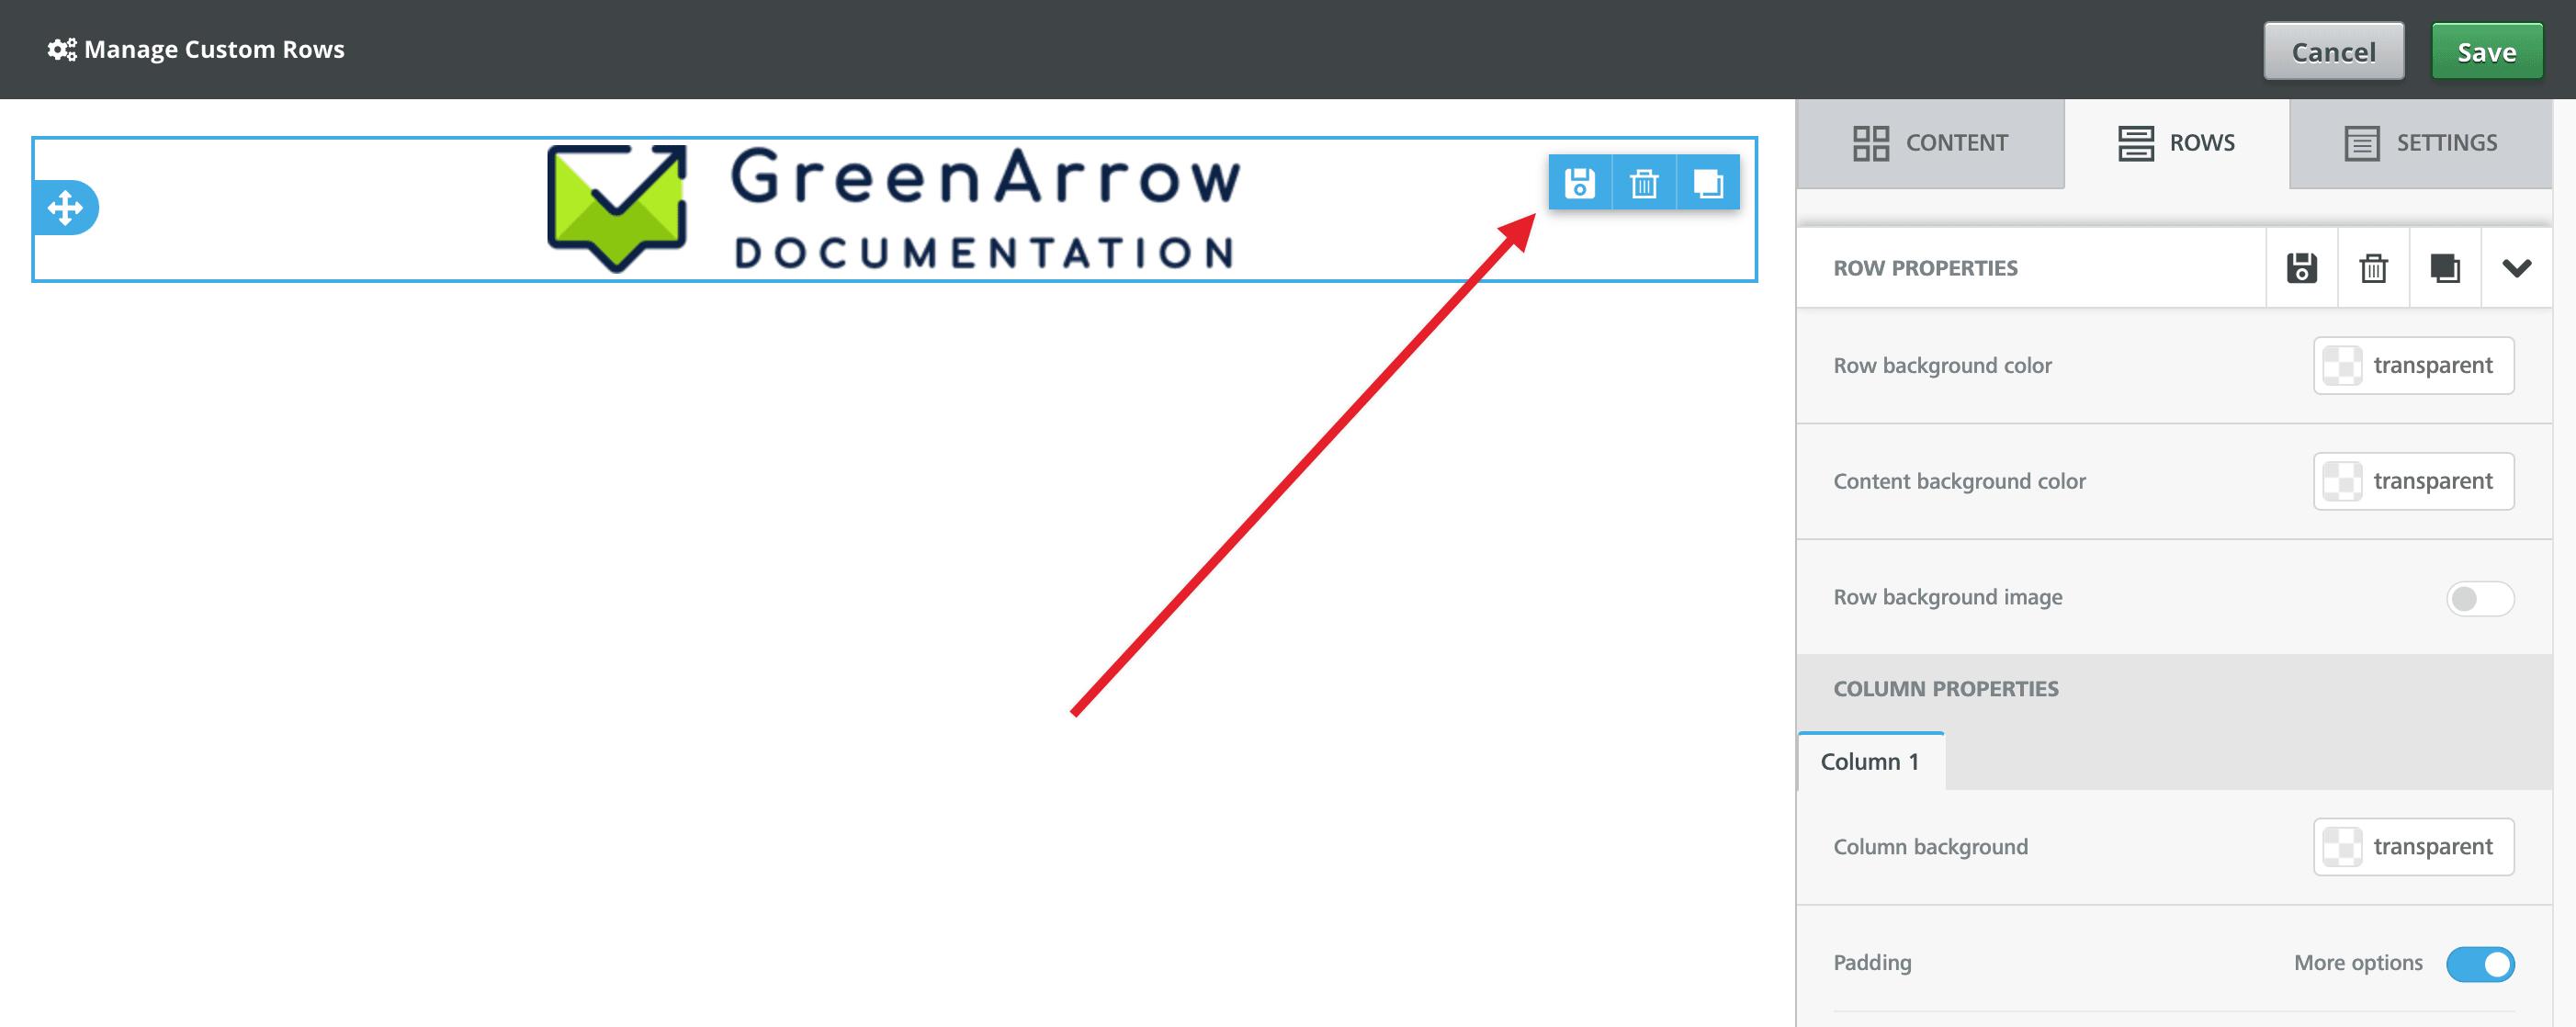 custom-rows-save-icon